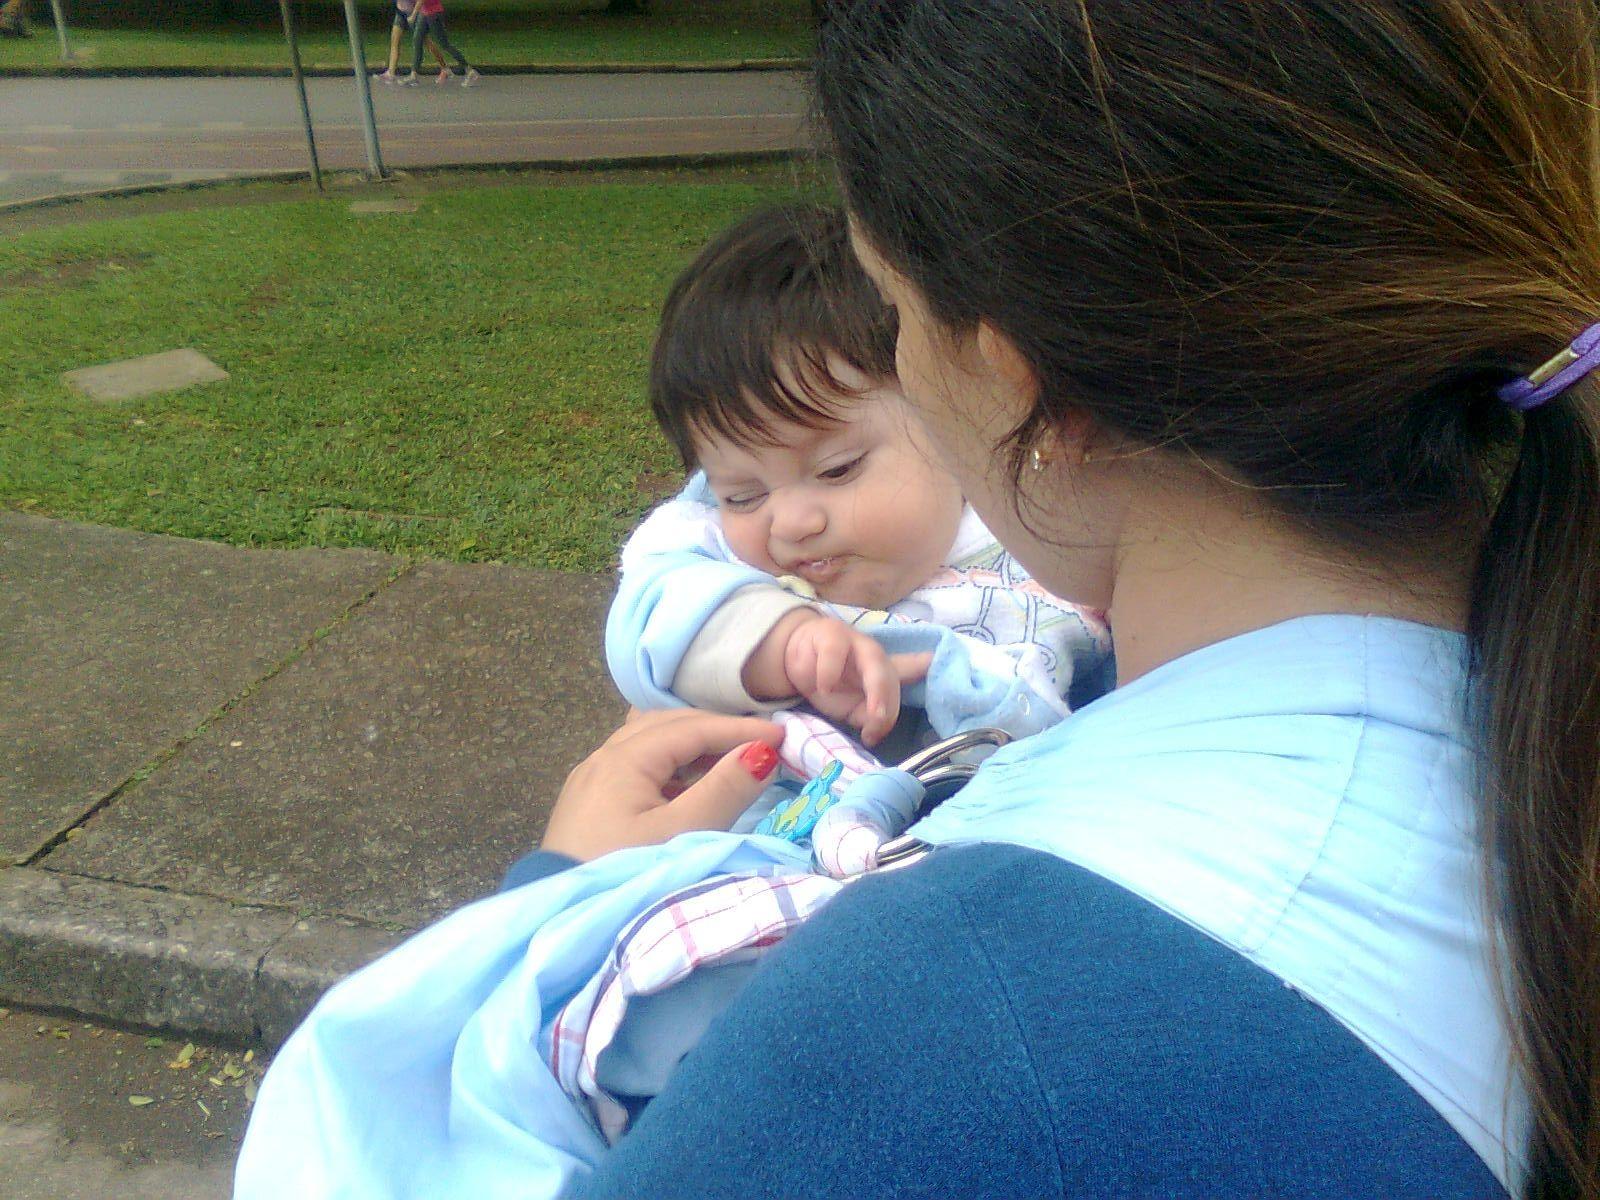 Primeiro dia no Parque Ibirapuera...